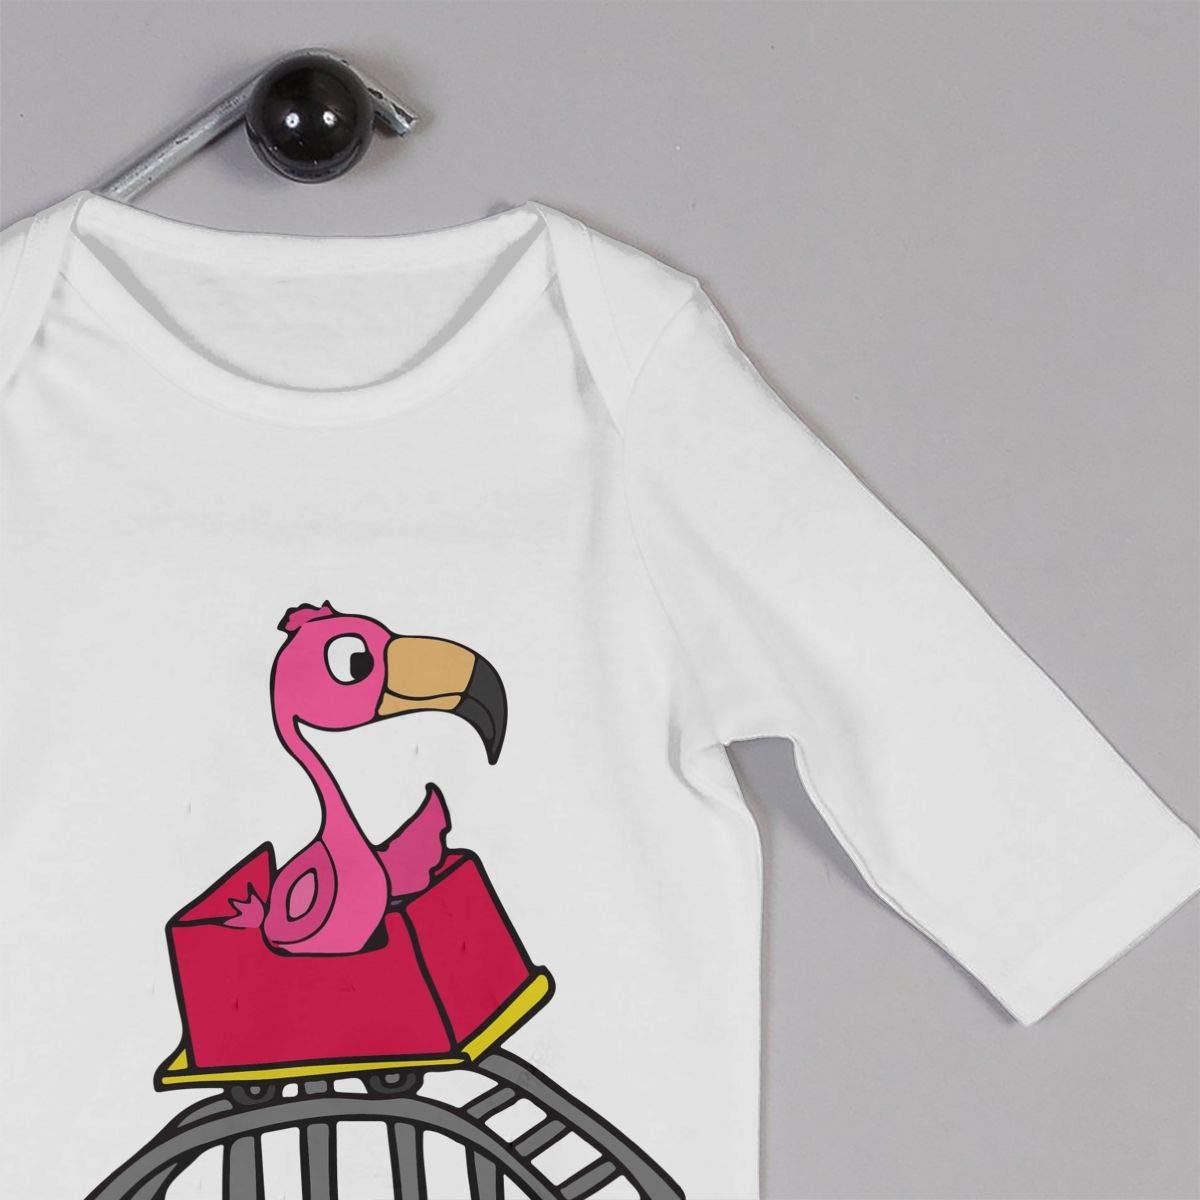 LBJQ8 Pink Flamingo Riding Roller Coaster Newborn Baby Girl Infant Organic Cotton Pajamas Sleeper